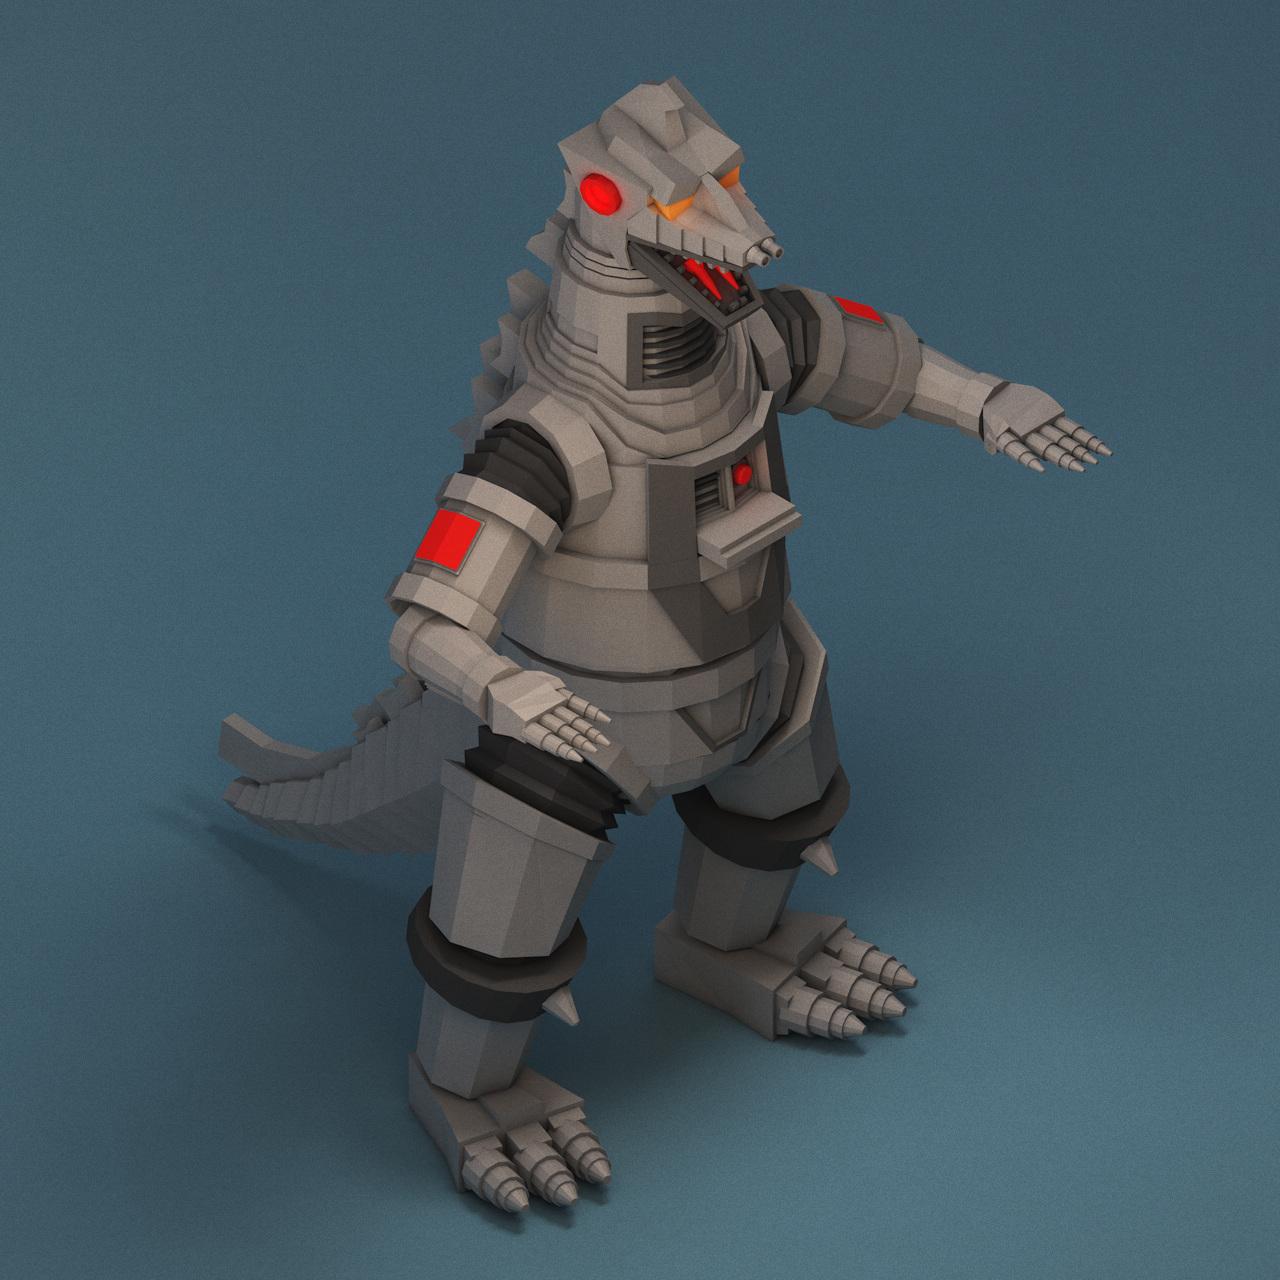 Mecha-Godzilla_solo_003_30_o_1280